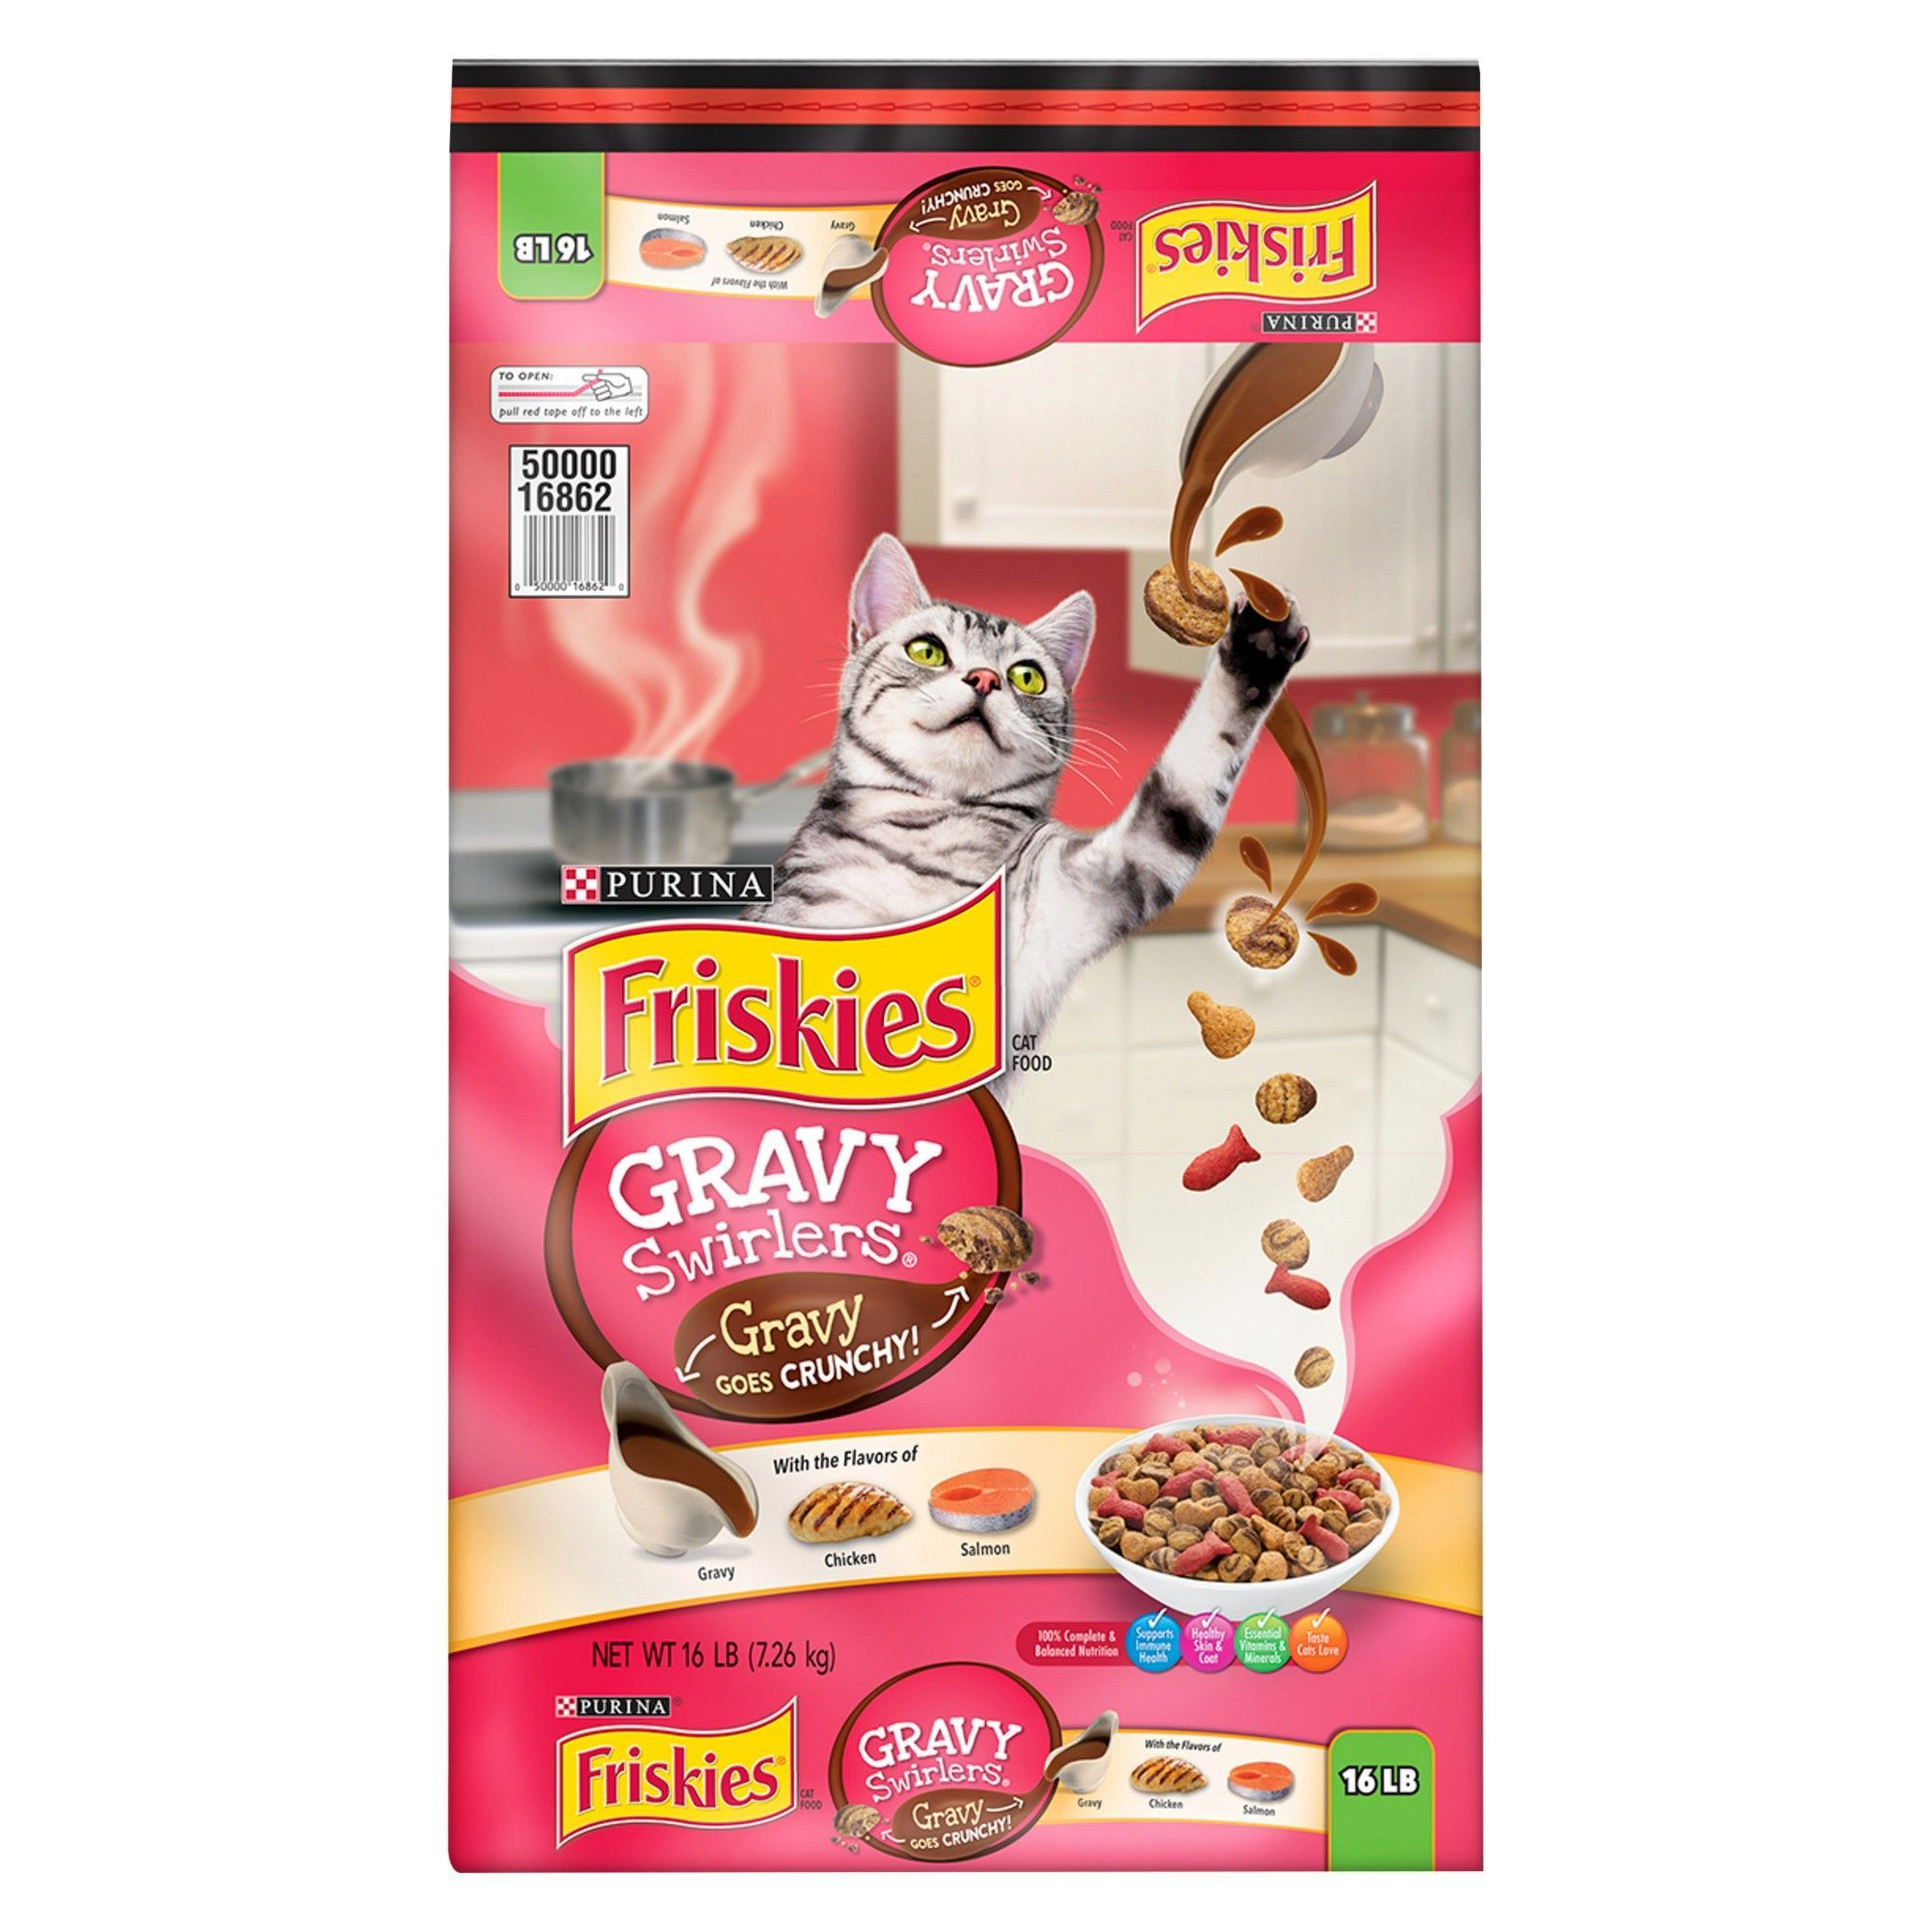 Pin By Nikos Barwell On Pet Supplies In 2020 Dry Cat Food Friskies Purina Friskies